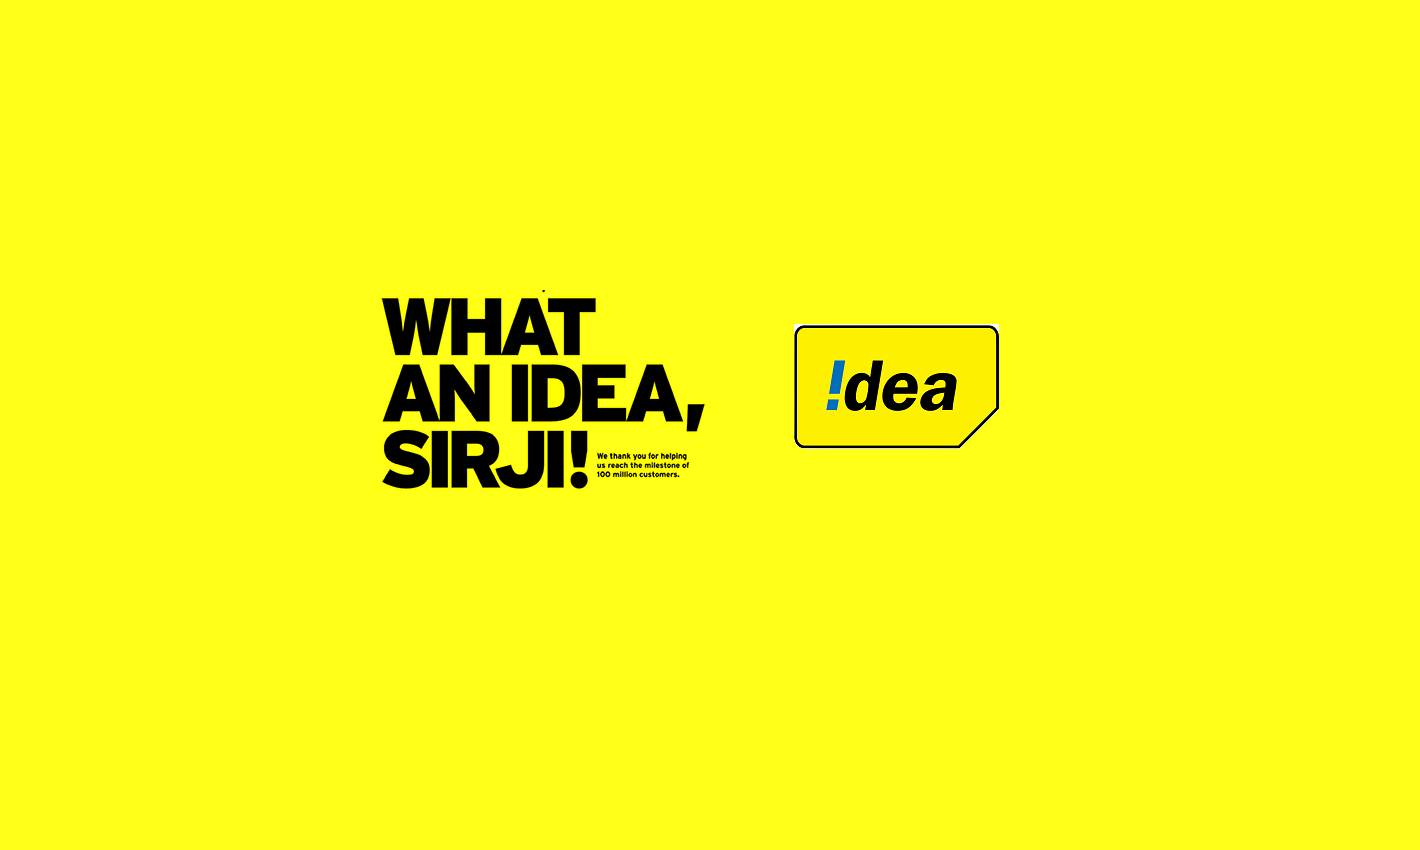 idea-499-plan